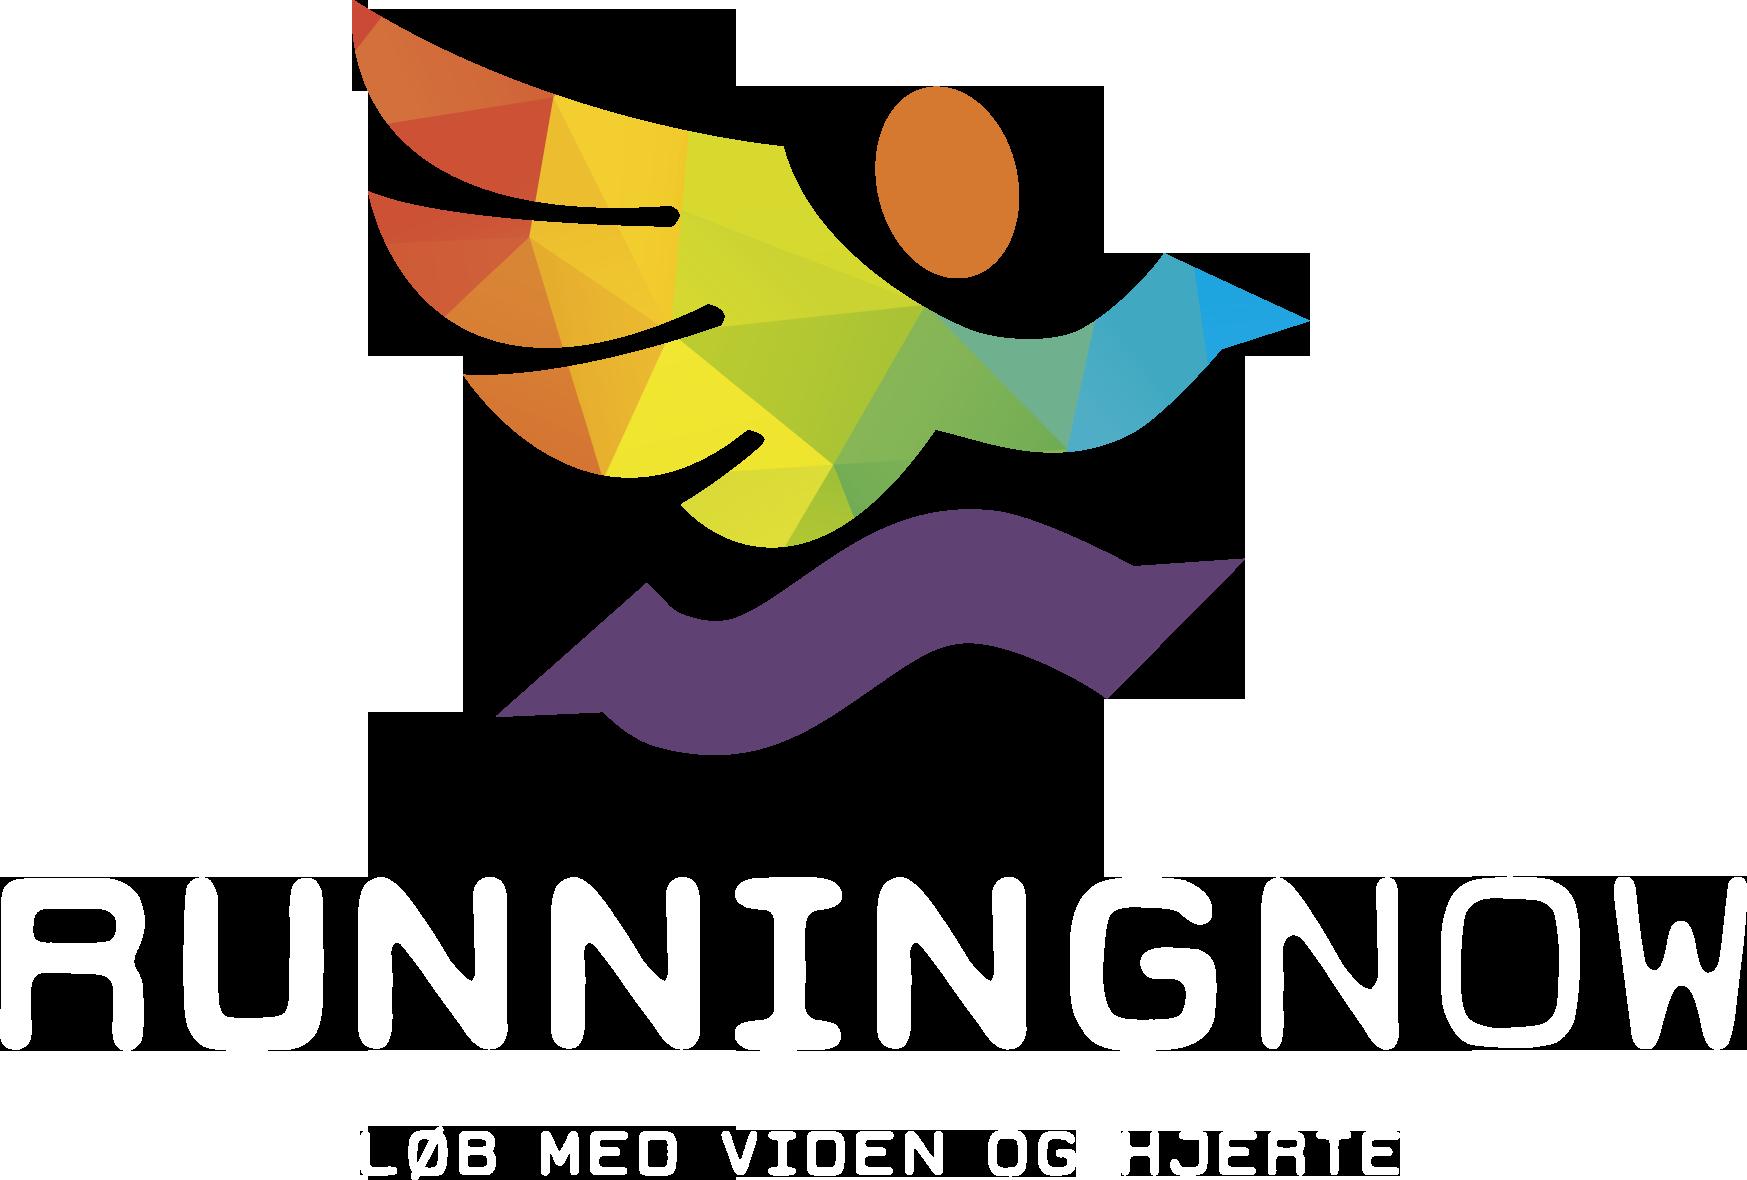 runningnow-loebeprogram-loebeklub-loebeskole-